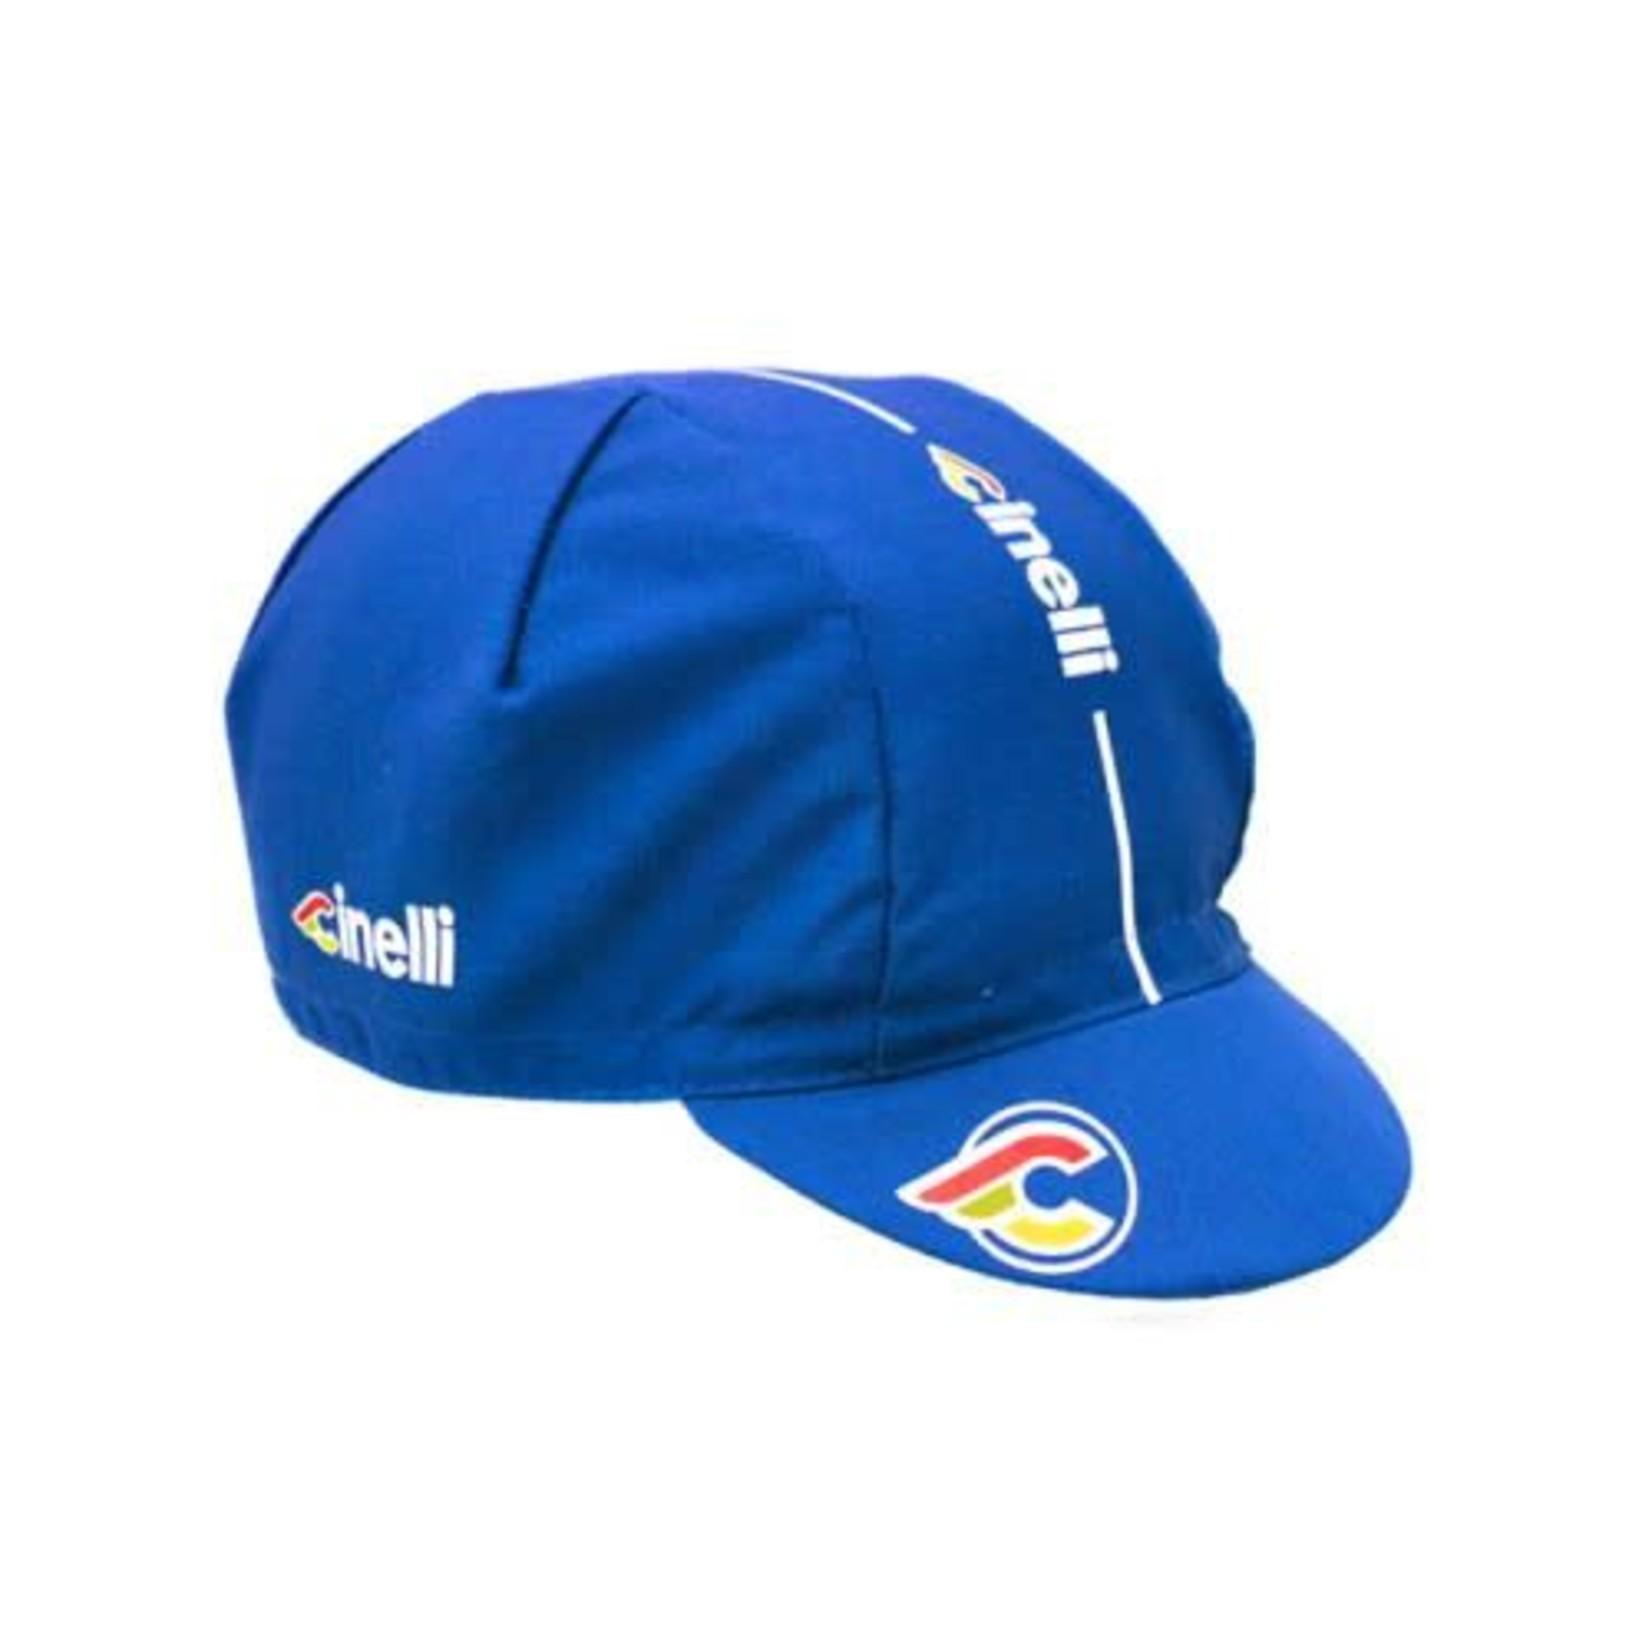 CINELLI CINELLI CAPS SUPERCORSA, BLUE